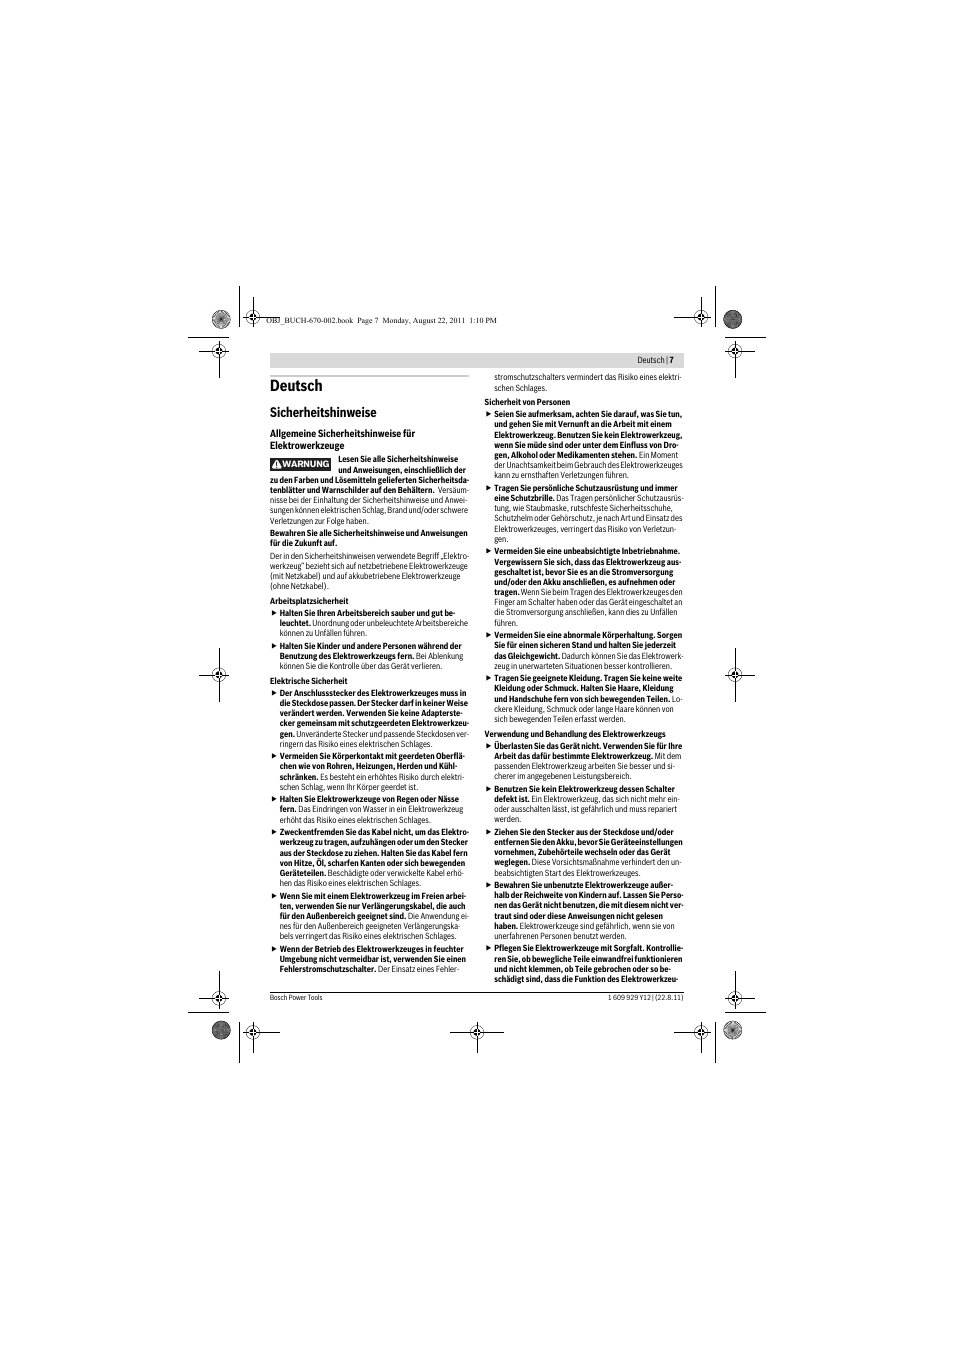 Bosch pfs 55 user manual | page 116 / 191 | original mode.